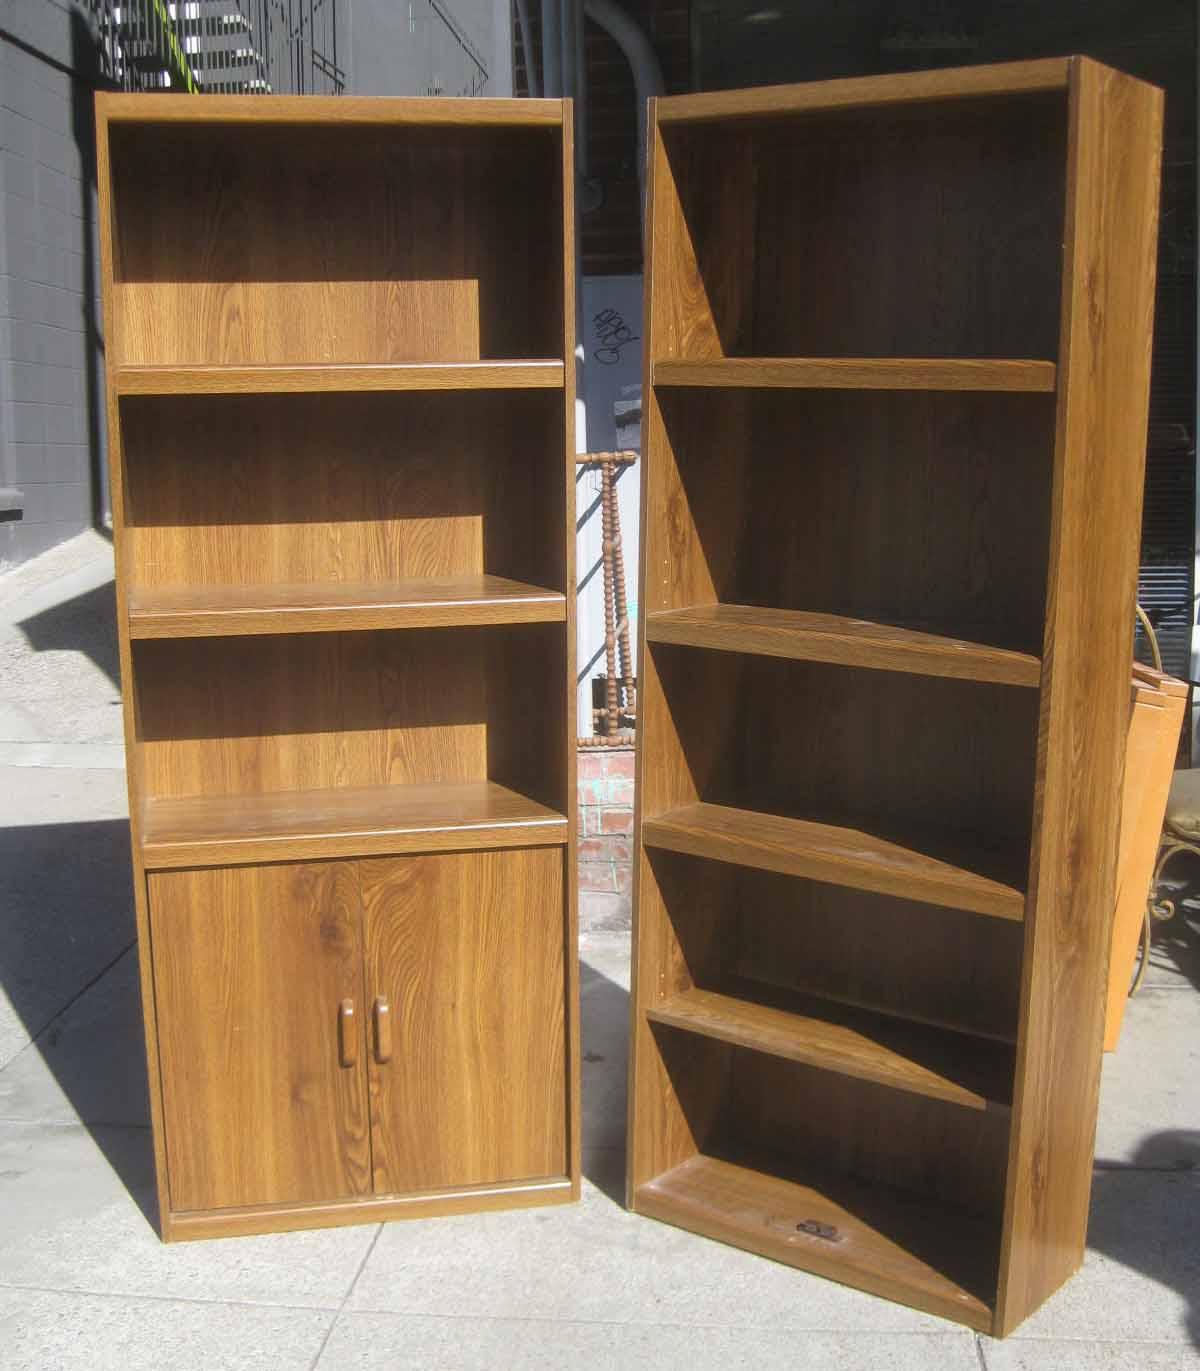 Pressed Wood Bookshelf 1200 x 1371